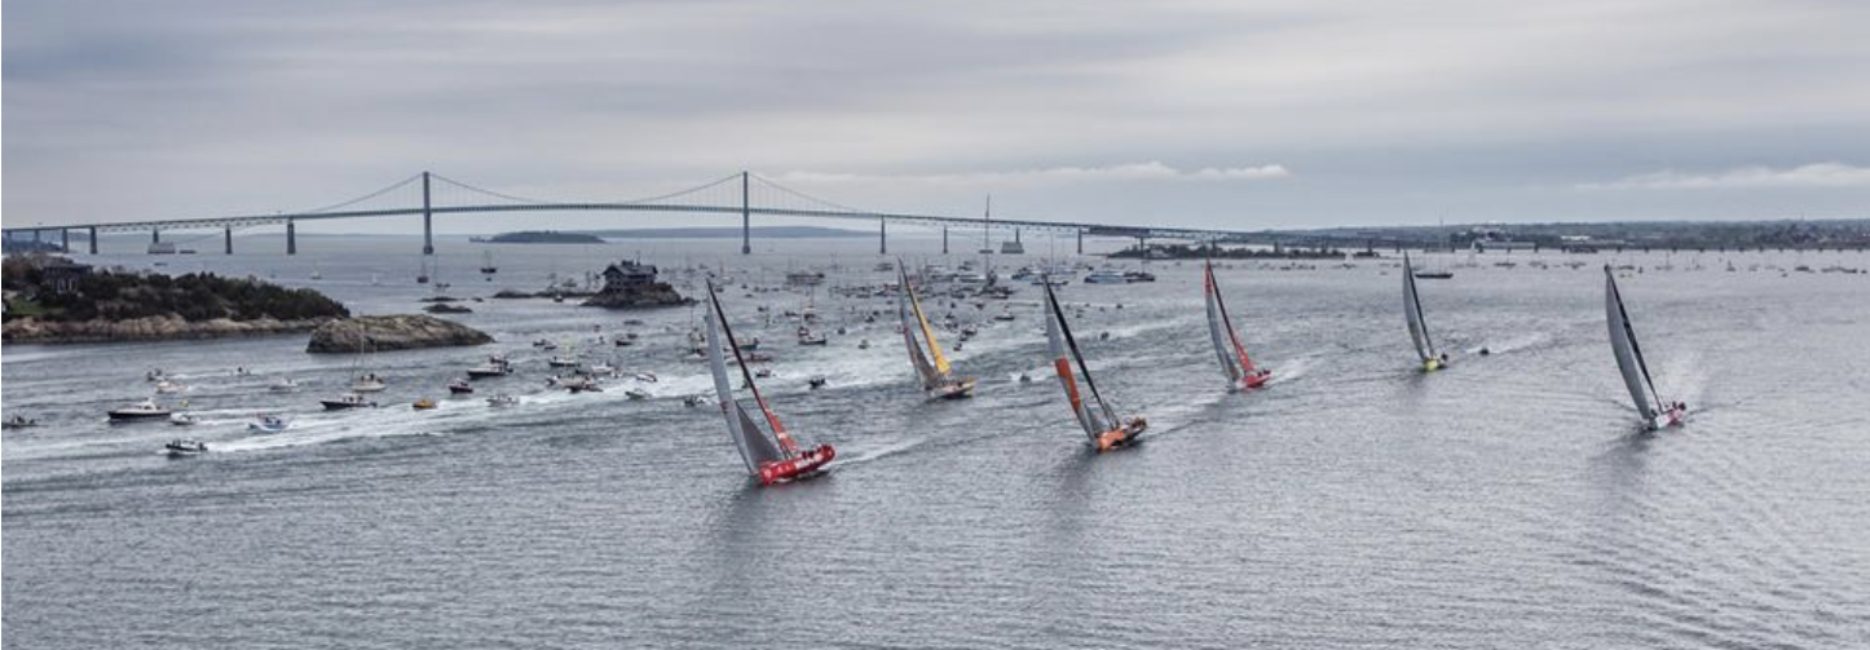 Newport, RI Events: Volvo Ocean Race May 2018